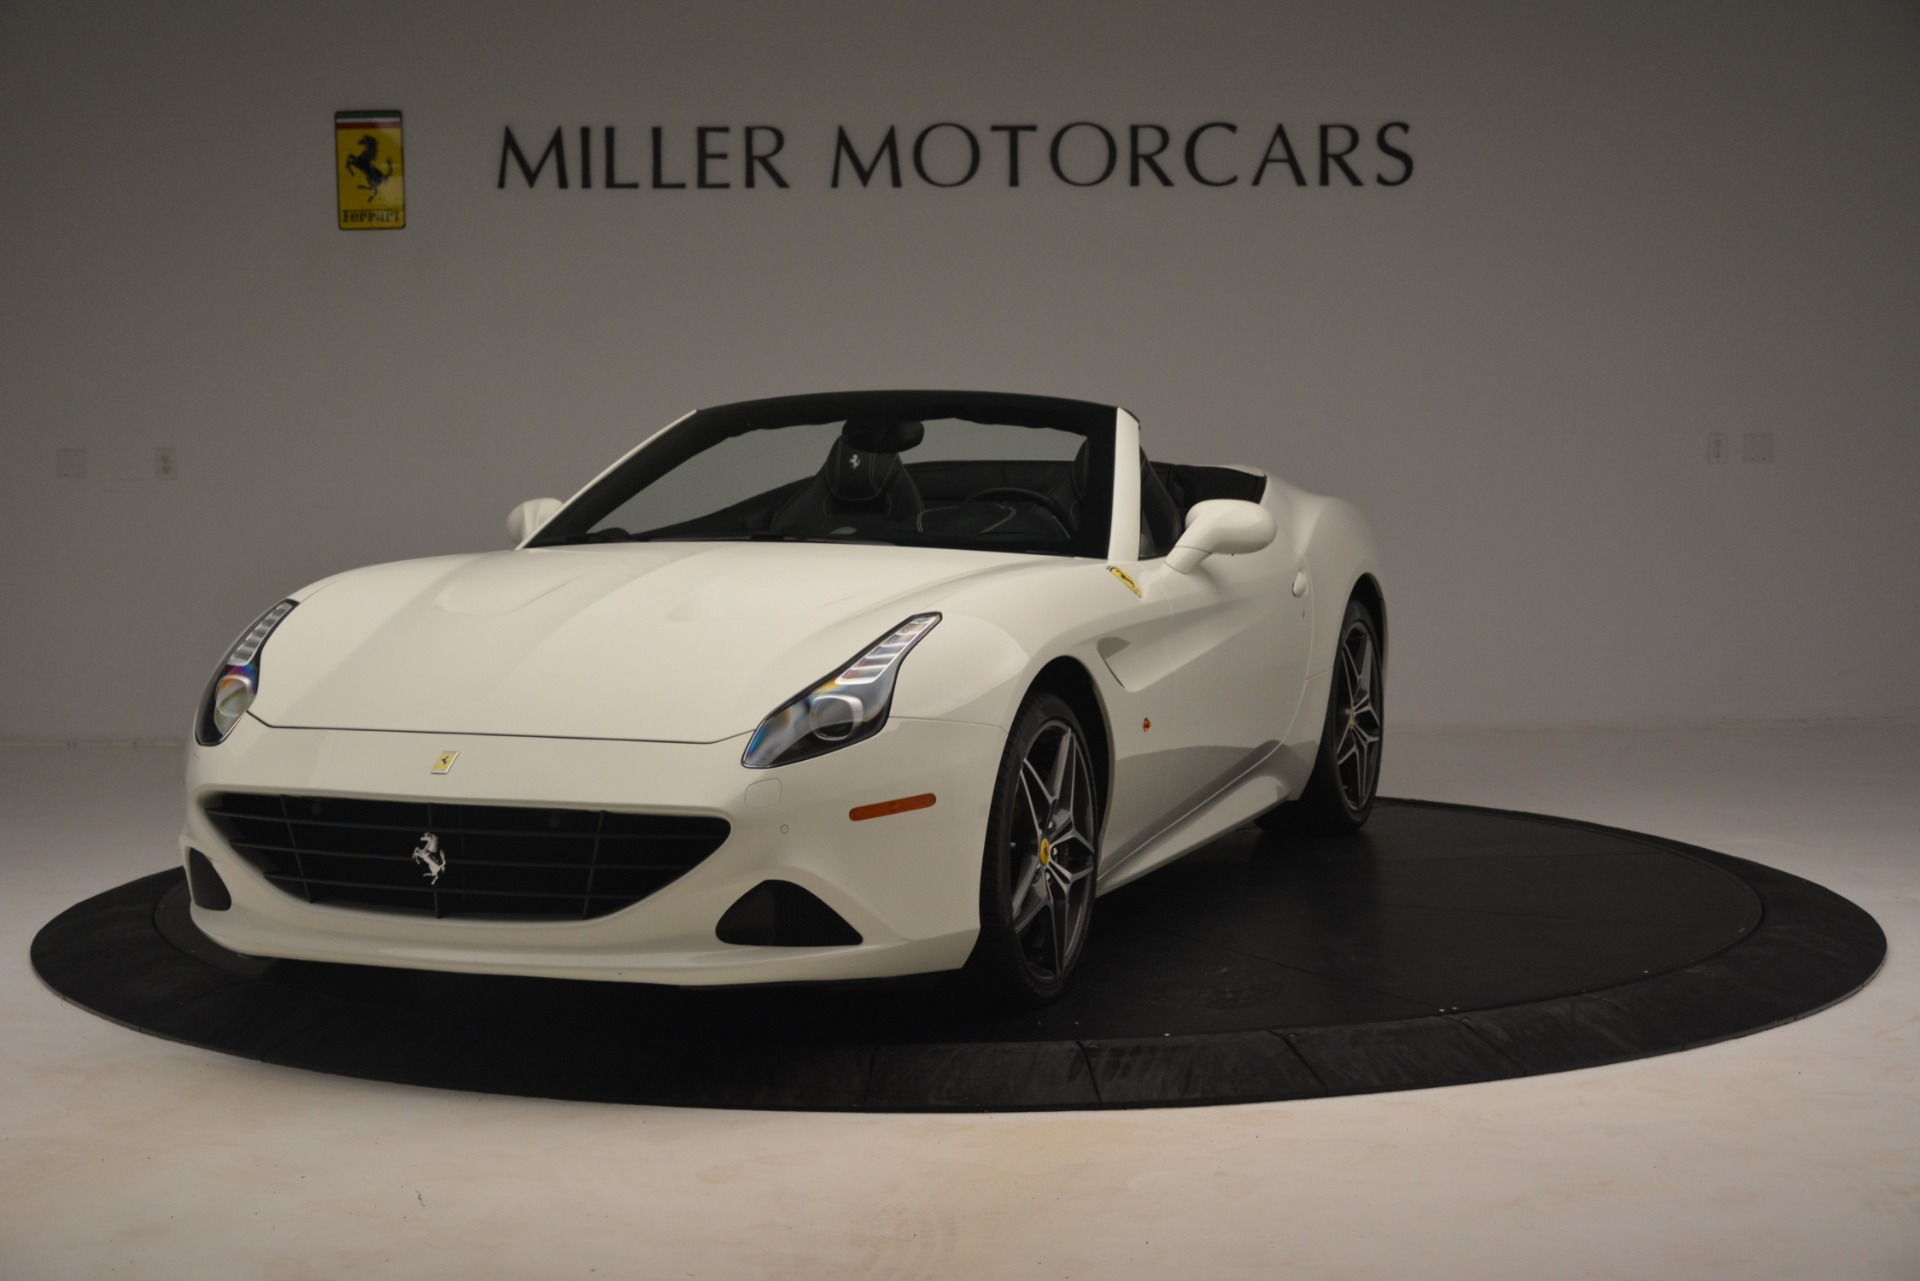 Used 2016 Ferrari California T for sale $145,900 at Pagani of Greenwich in Greenwich CT 06830 1